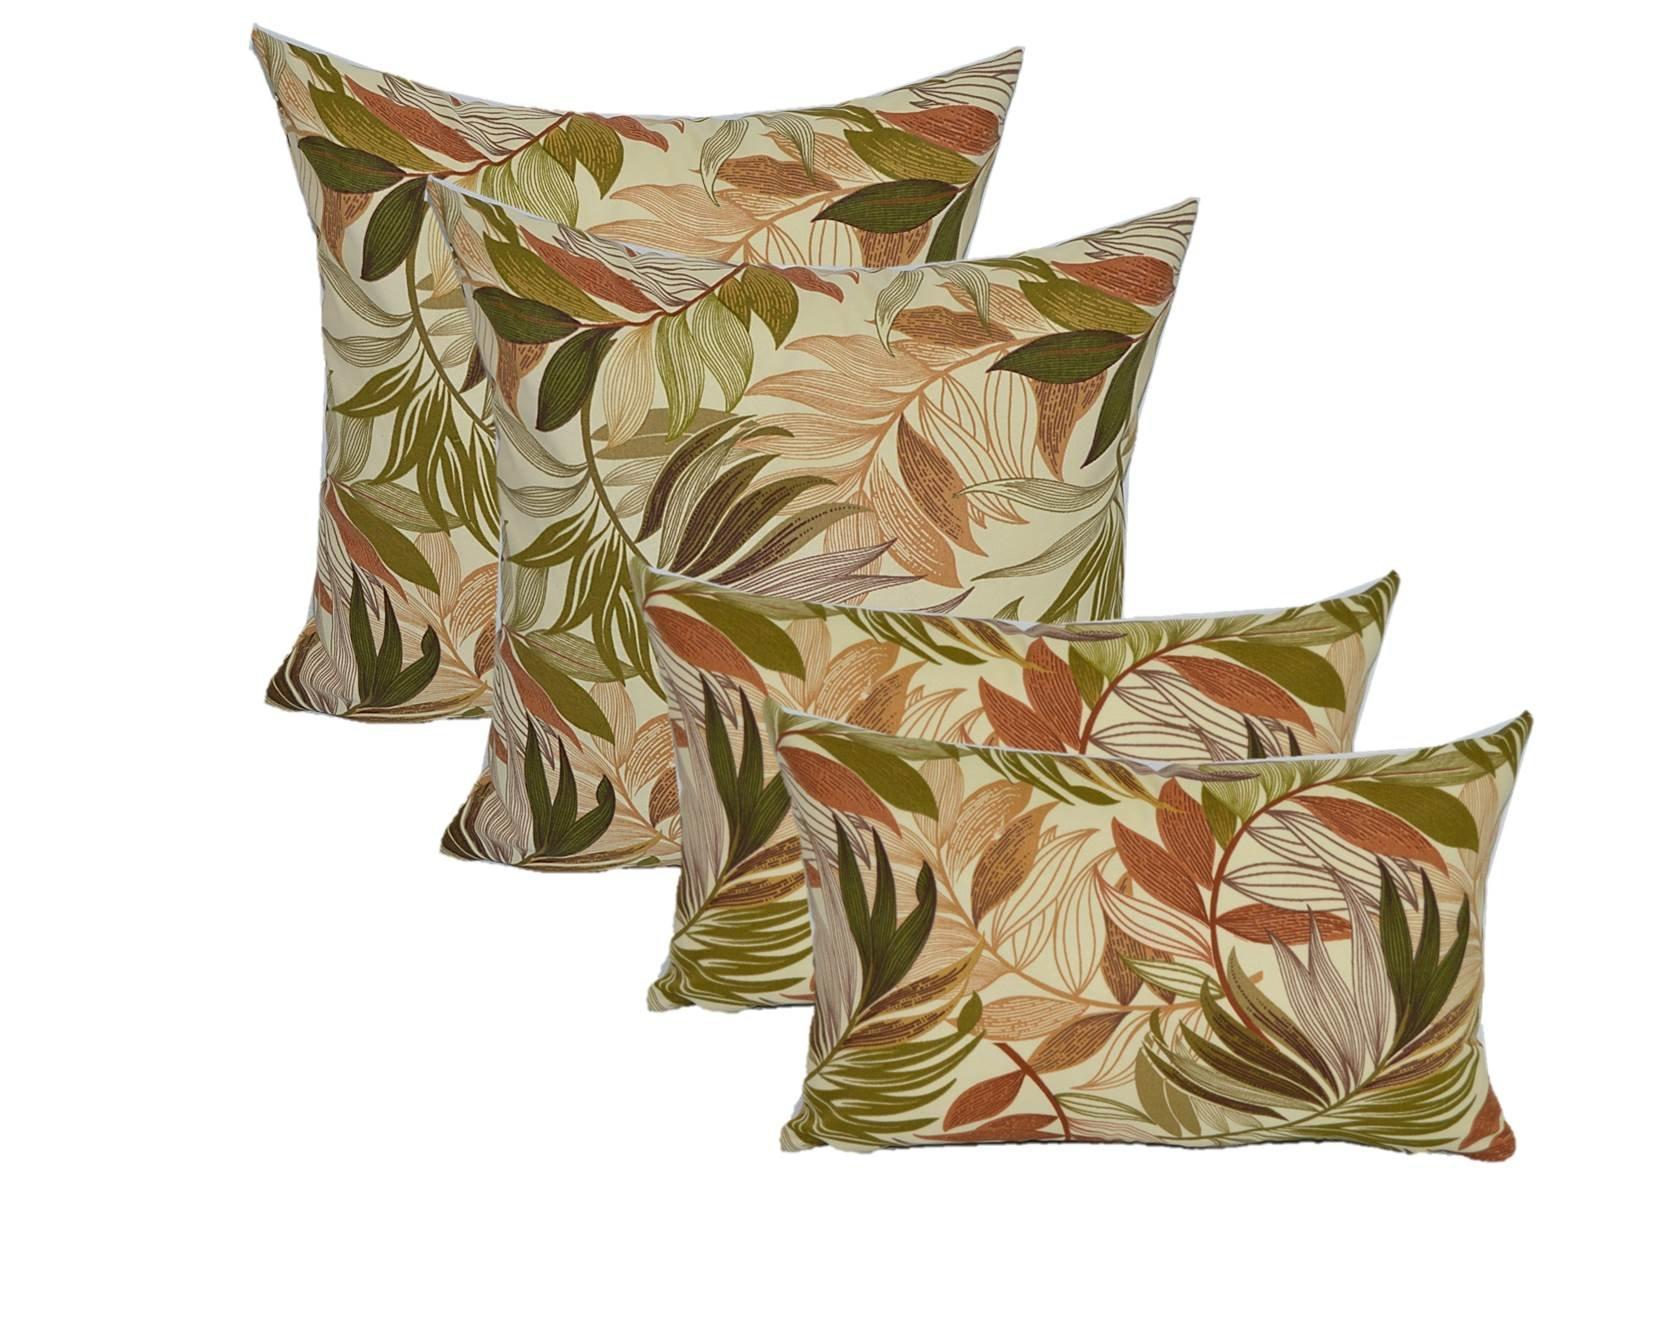 Set of 4 In / Outdoor Pillows - 2 Square Throw Pillows & 2 Rectangle / Lumbar Decorative Throw Pillows - White, Tan, Brown, Green, Tropical Palm Leaf - Choose Size (17''X17'' square & 11''X19'' lumbar)